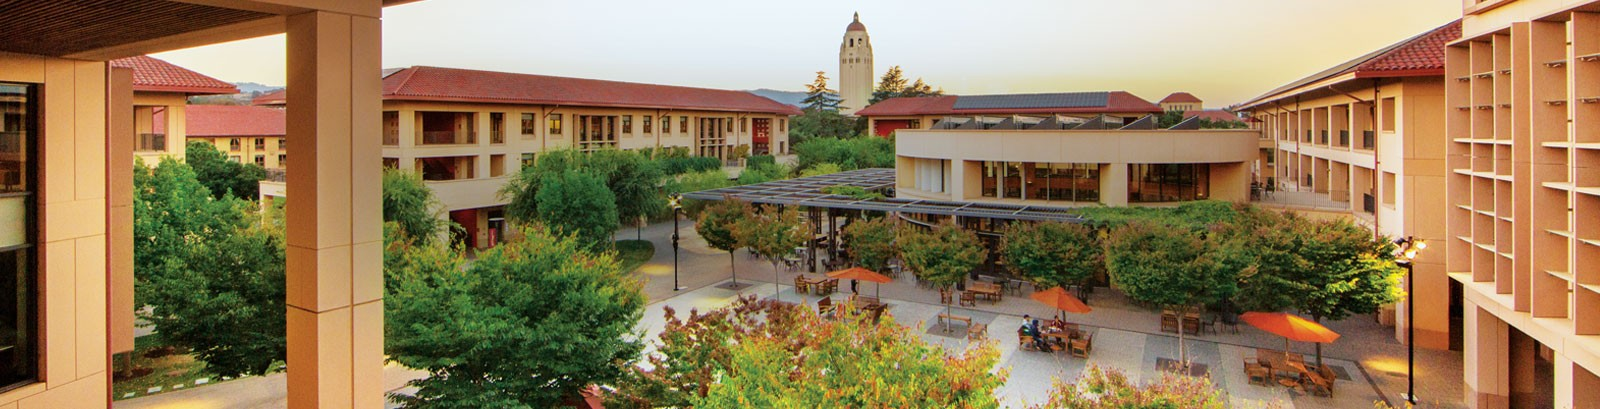 Stanford Management Company | LinkedIn